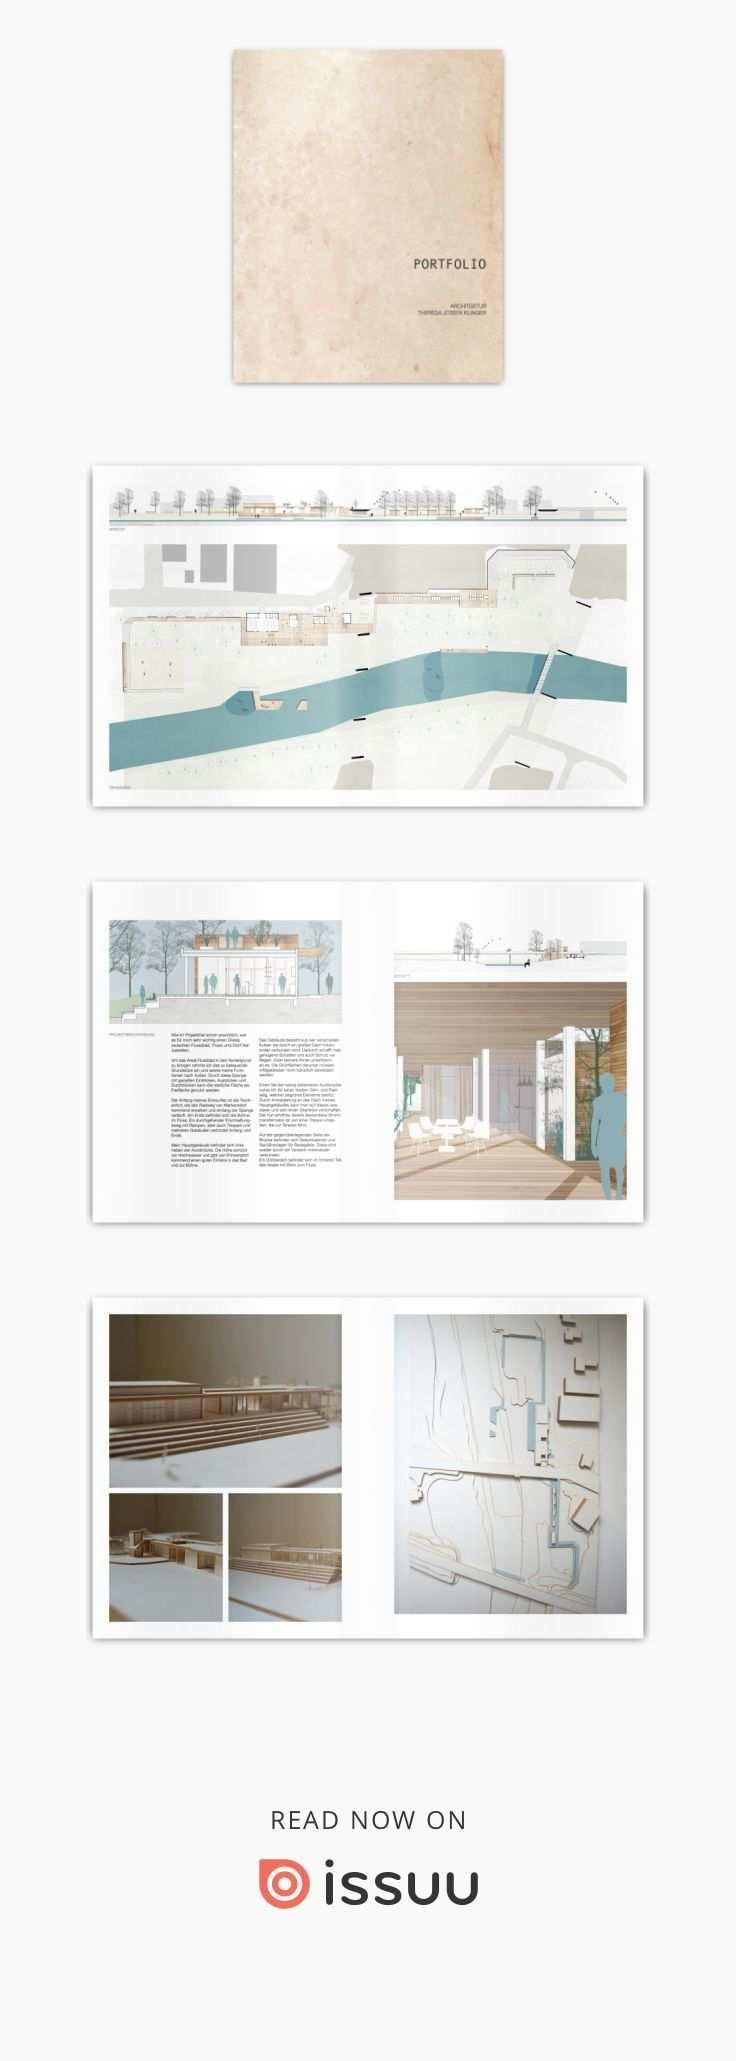 Portfolio Architektur Portfolio Architektur Diagramme Und Architektur Portfolio Layout